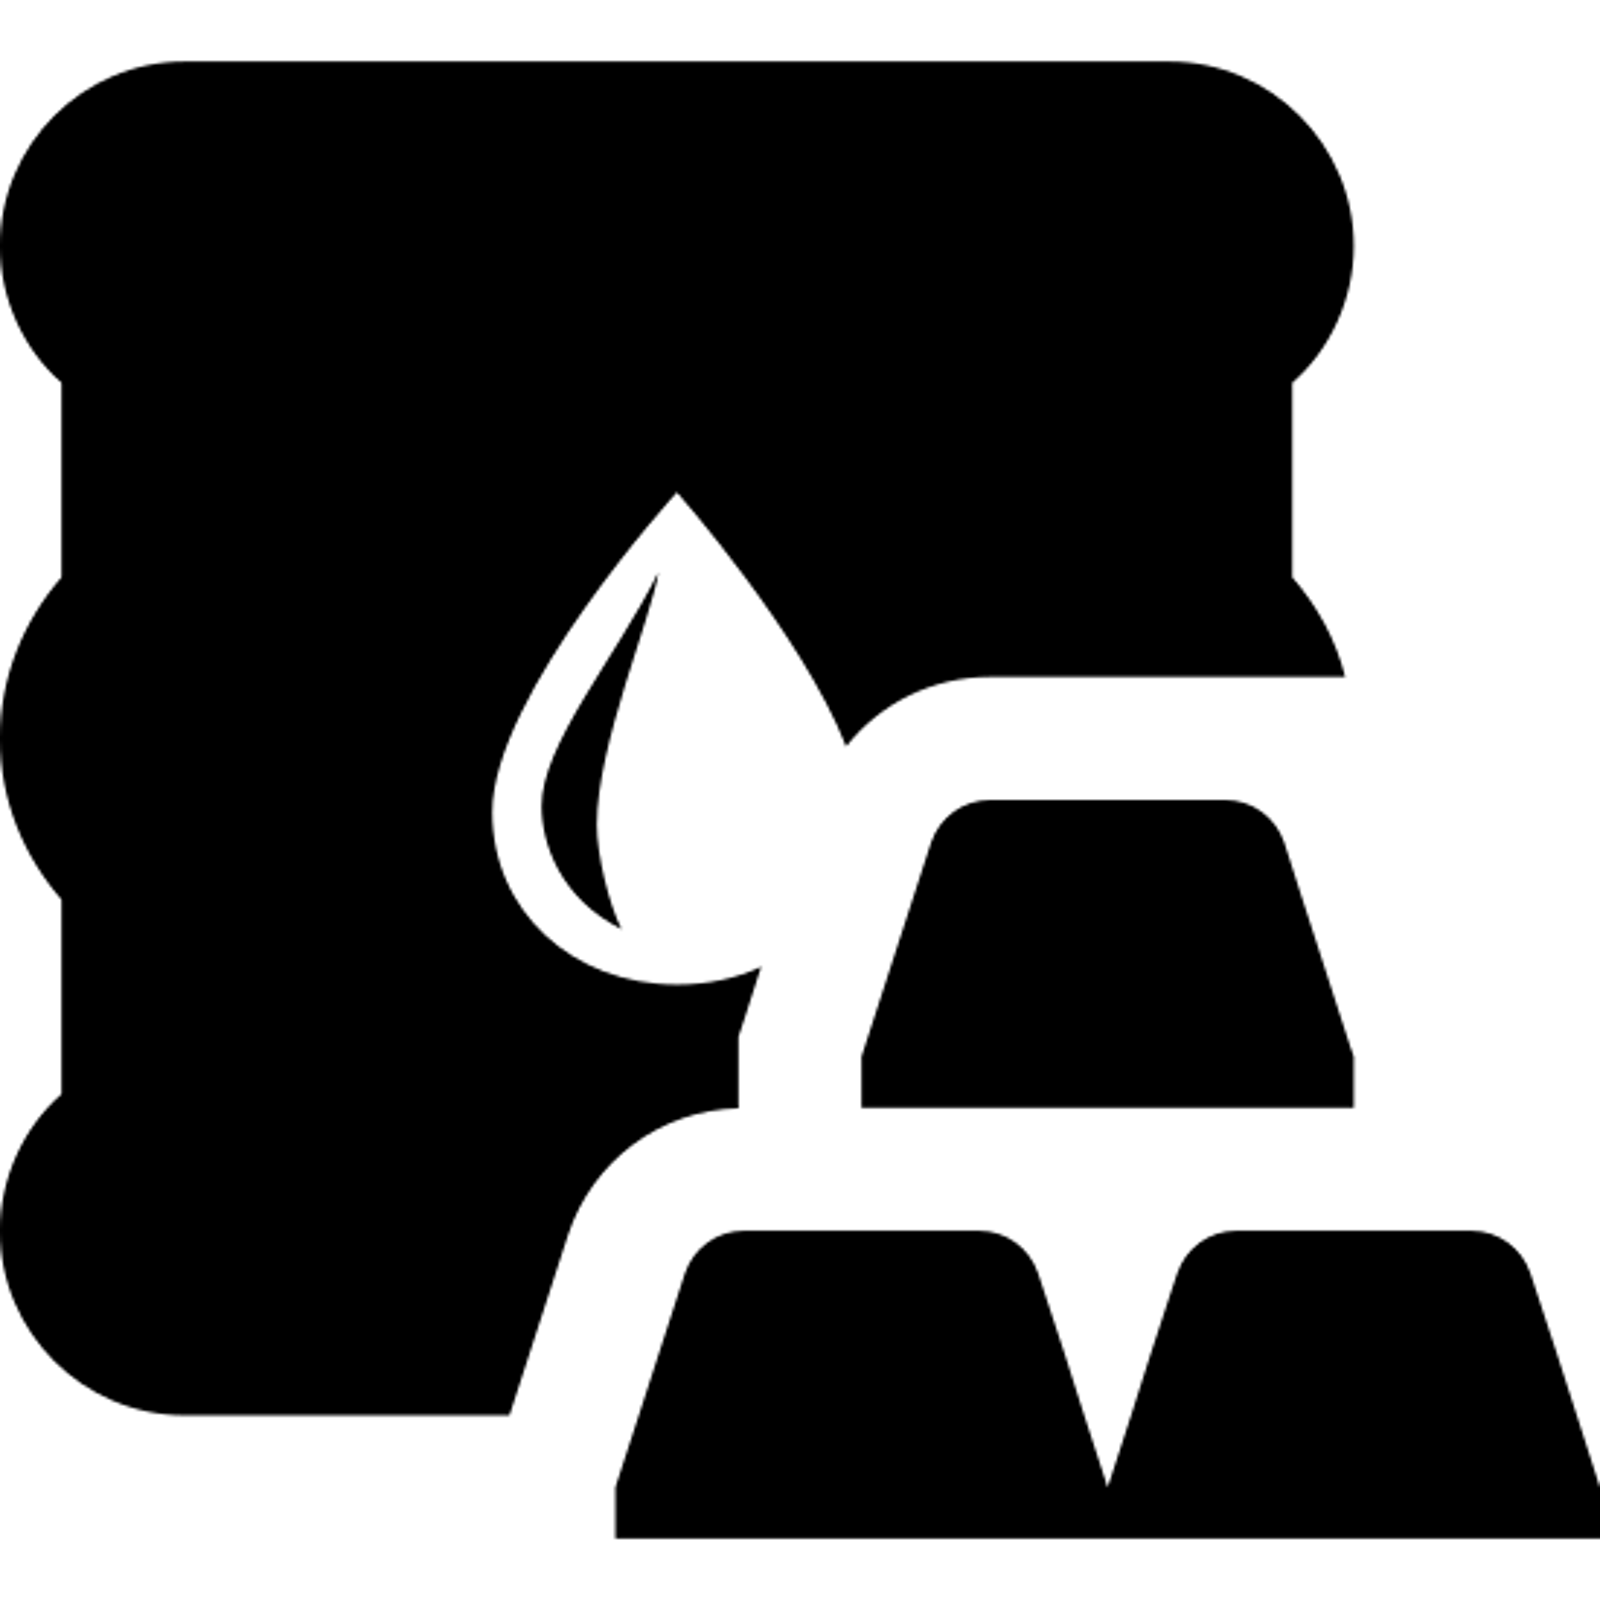 Towar icon